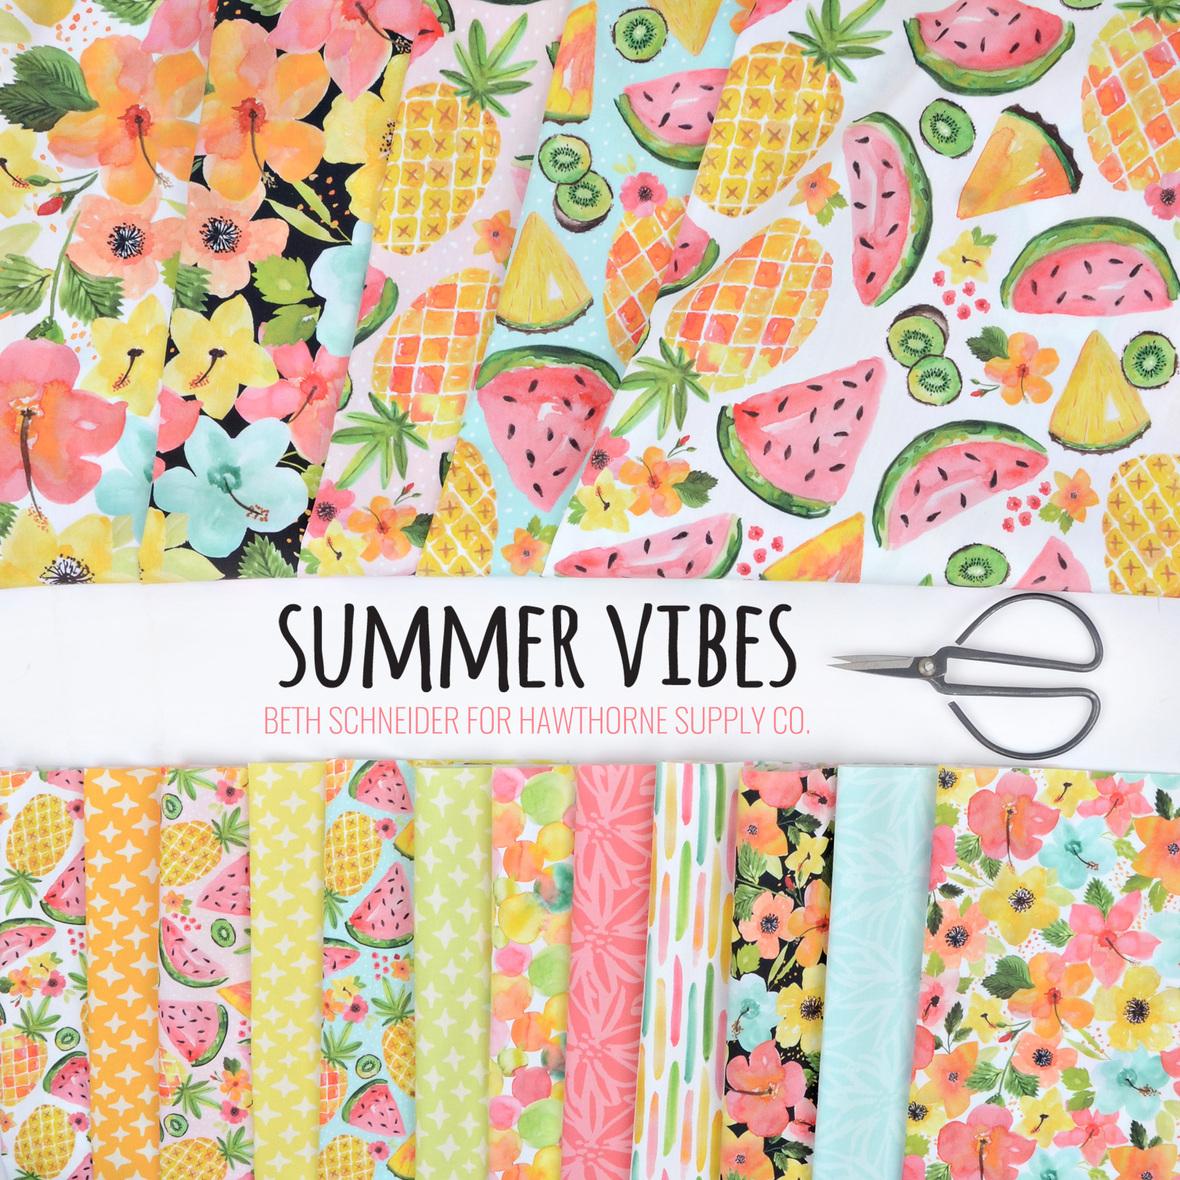 Summer Vibes Beth Schneider for Hawthorne Supply Co